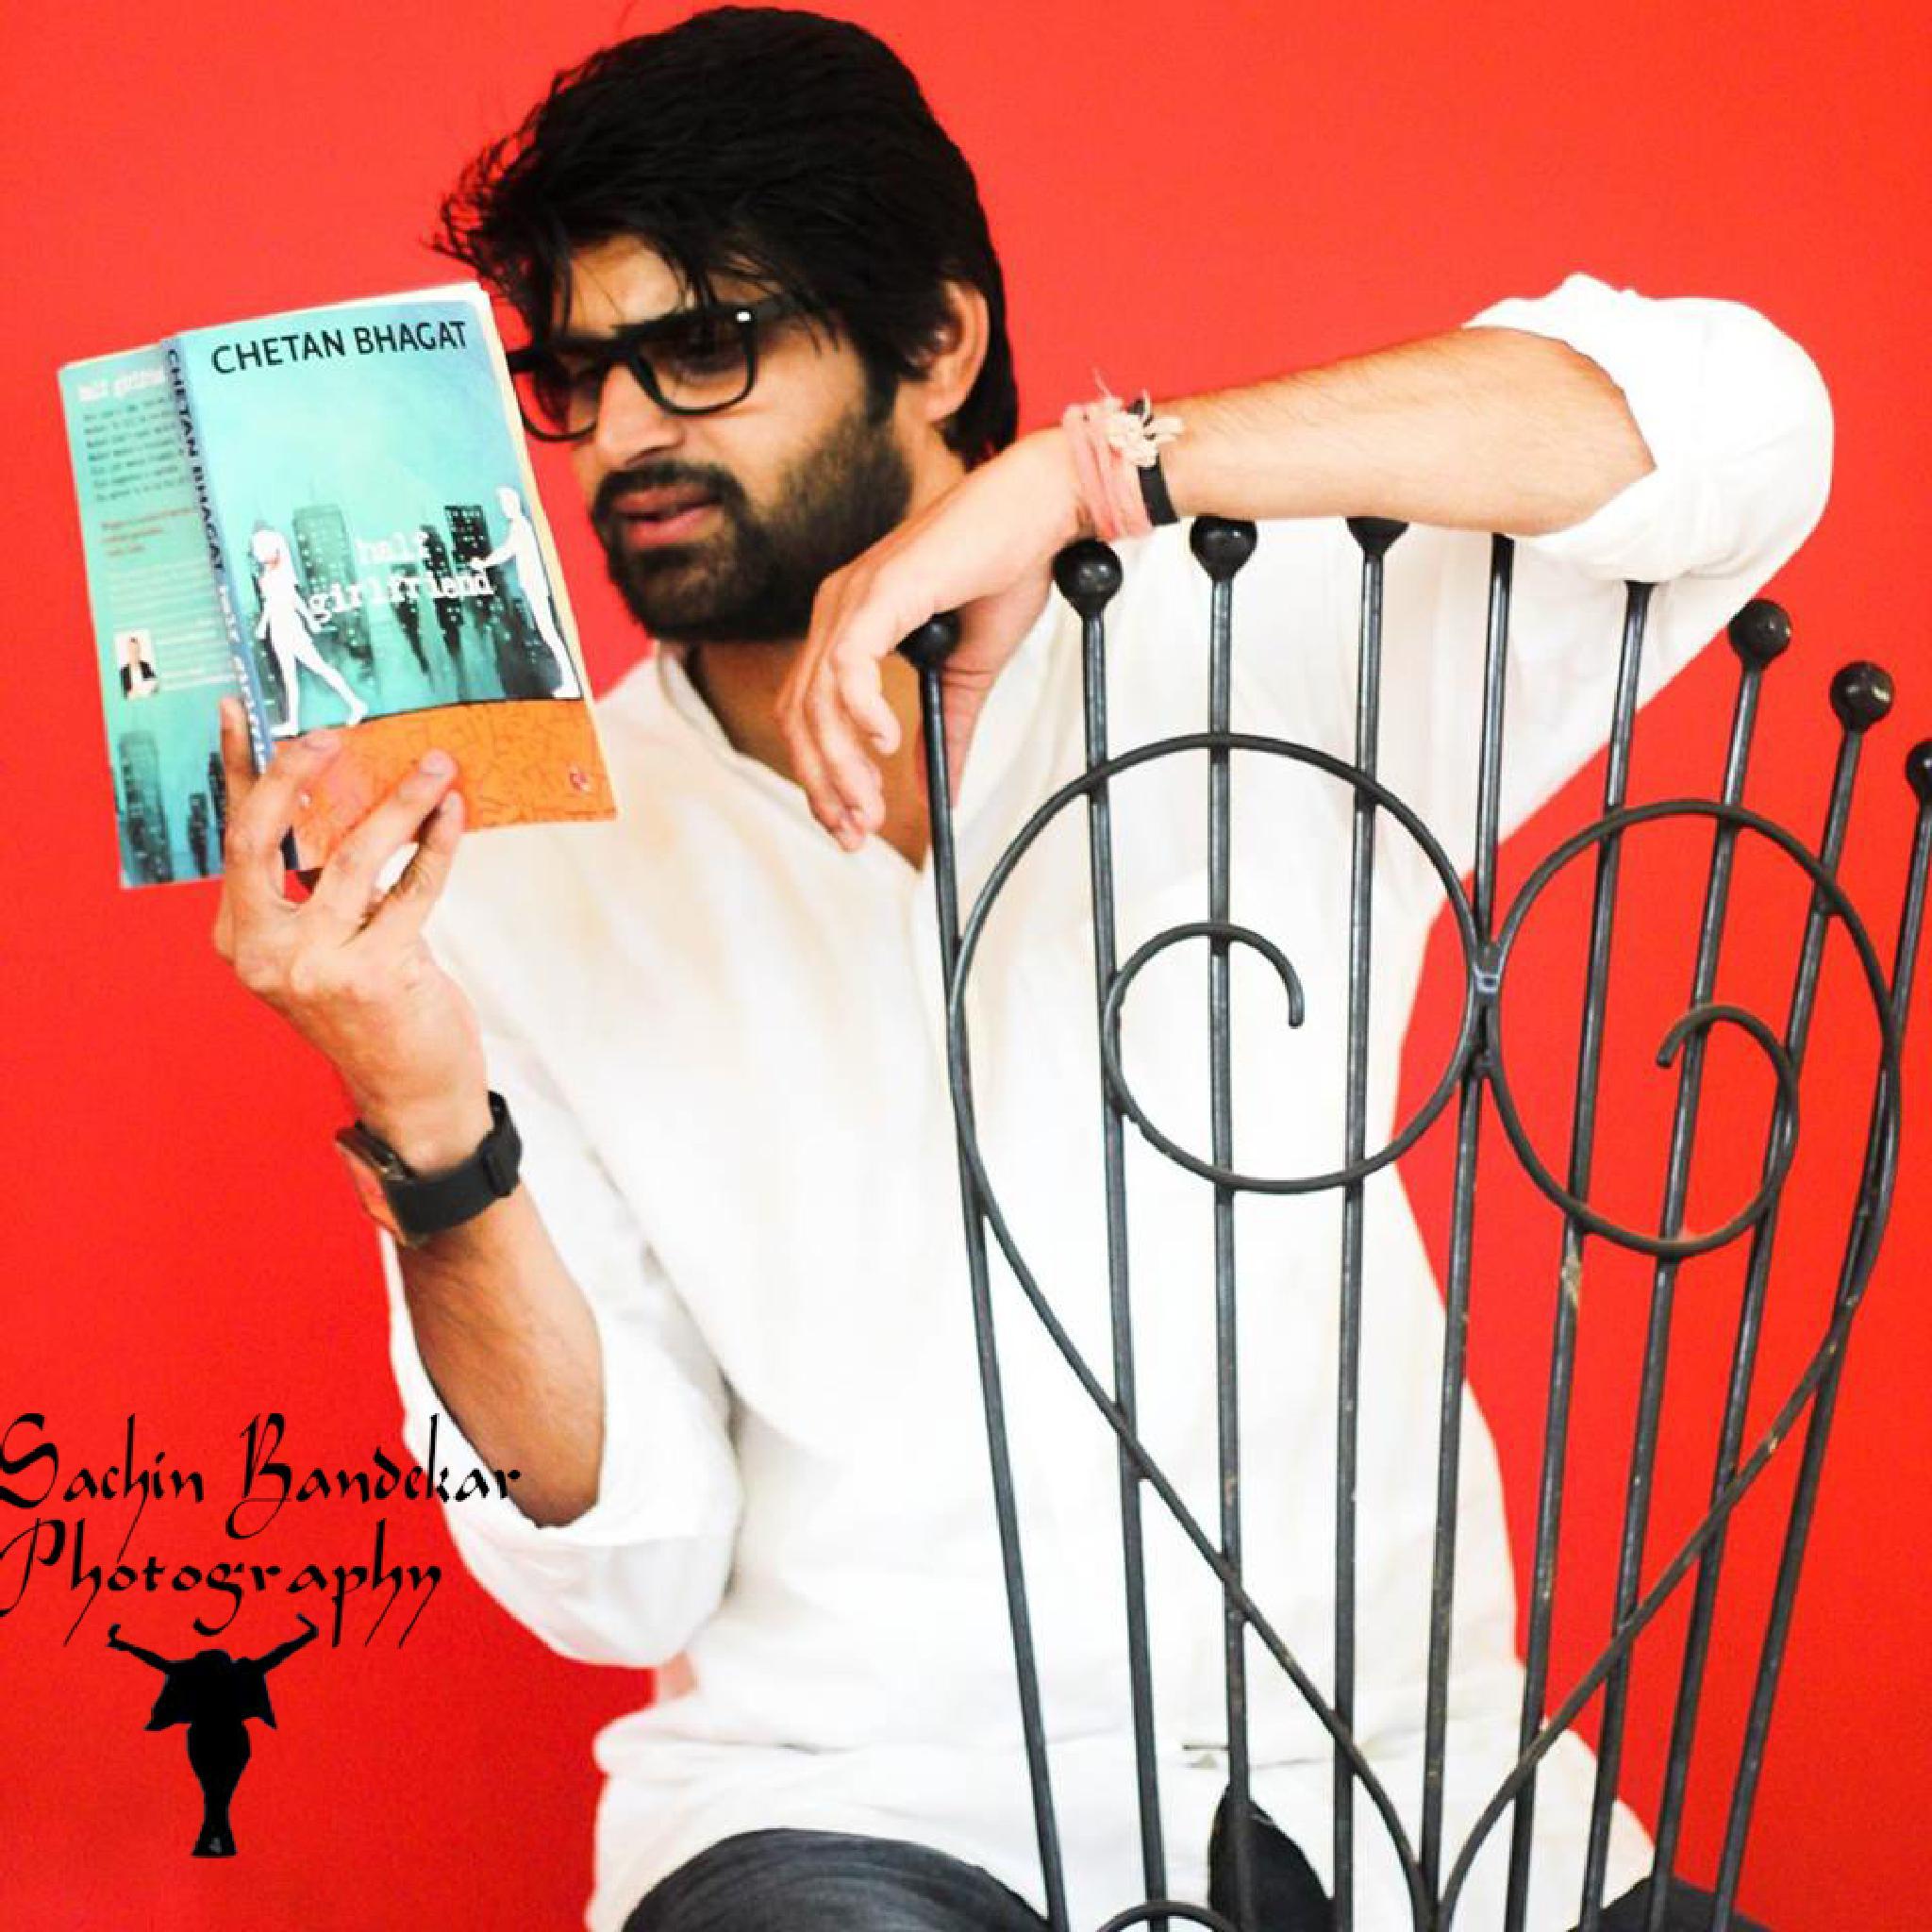 HaLF GiRLfRiEnD - I am tALkiNg ABt thE BooK  by Sachin Bandekar